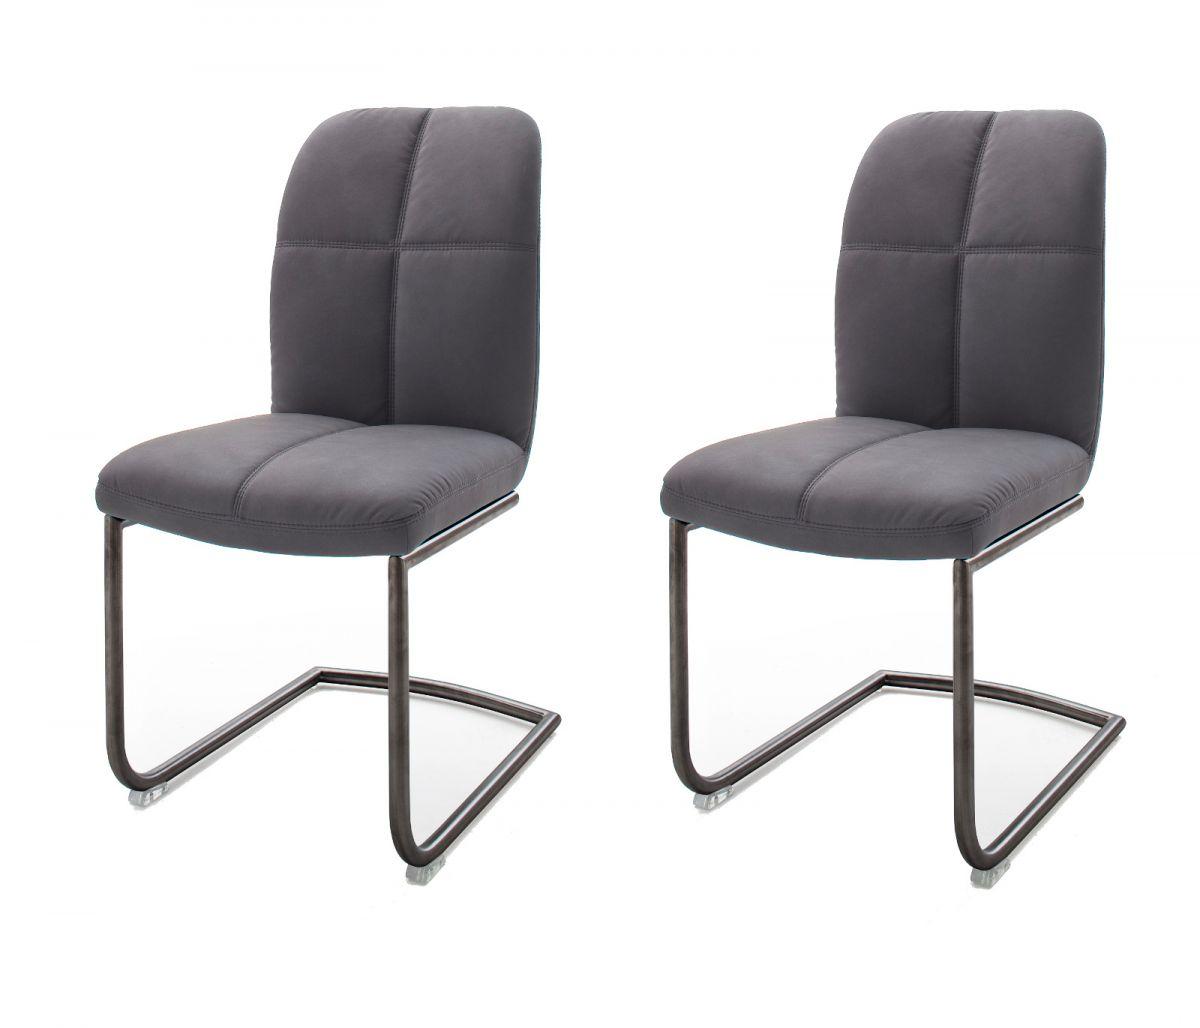 2 x Stuhl Tessera Grau Schwinger Kunstleder